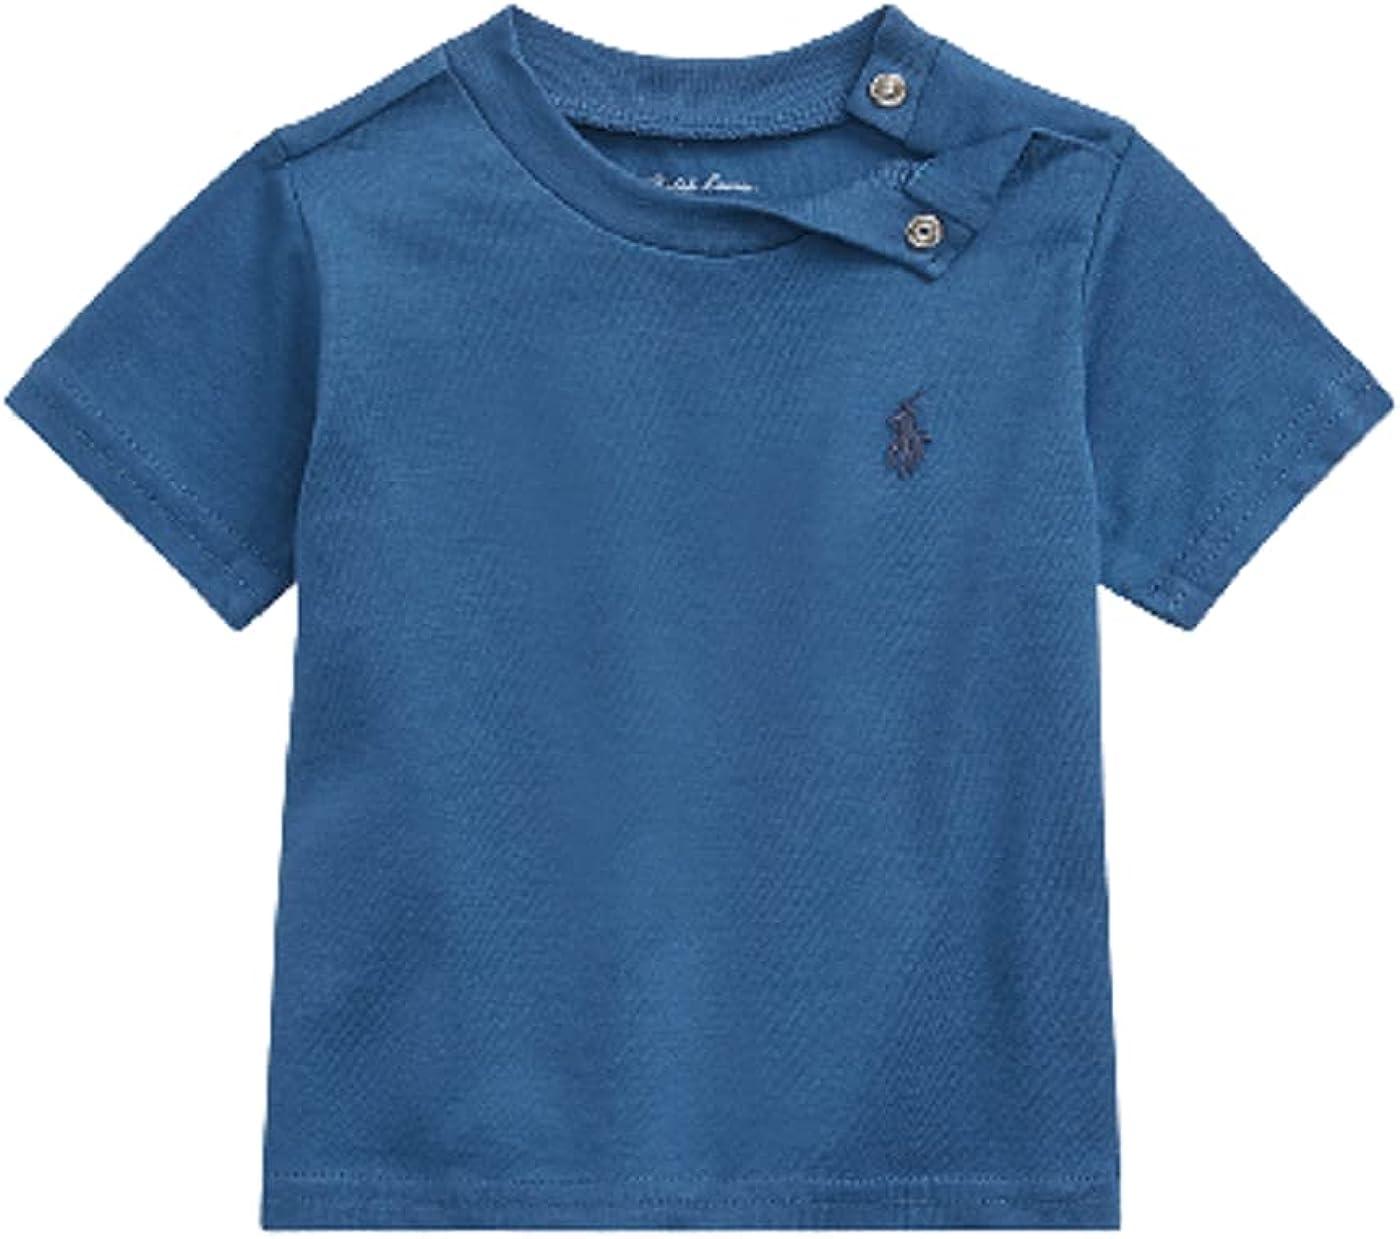 Polo Ralph Lauren Cobalt Heather Boys Cotton Jersey Crewneck T-Shirt, US 7